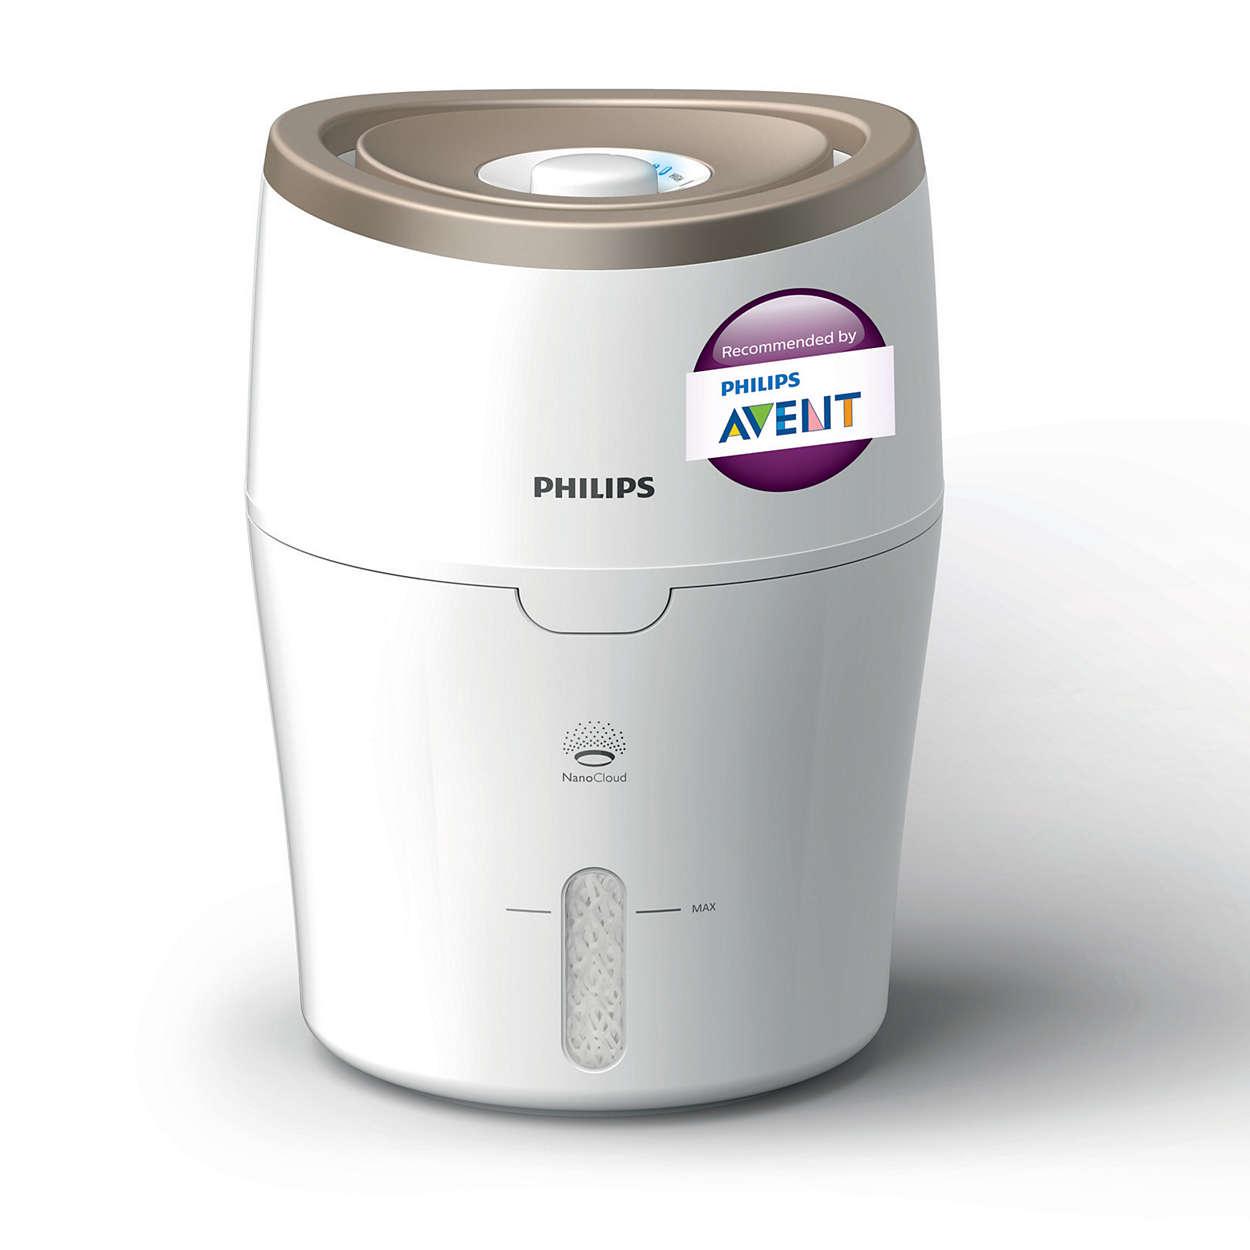 Series 2000 جهاز ترطيب الهواء Hu4811 30 Philips